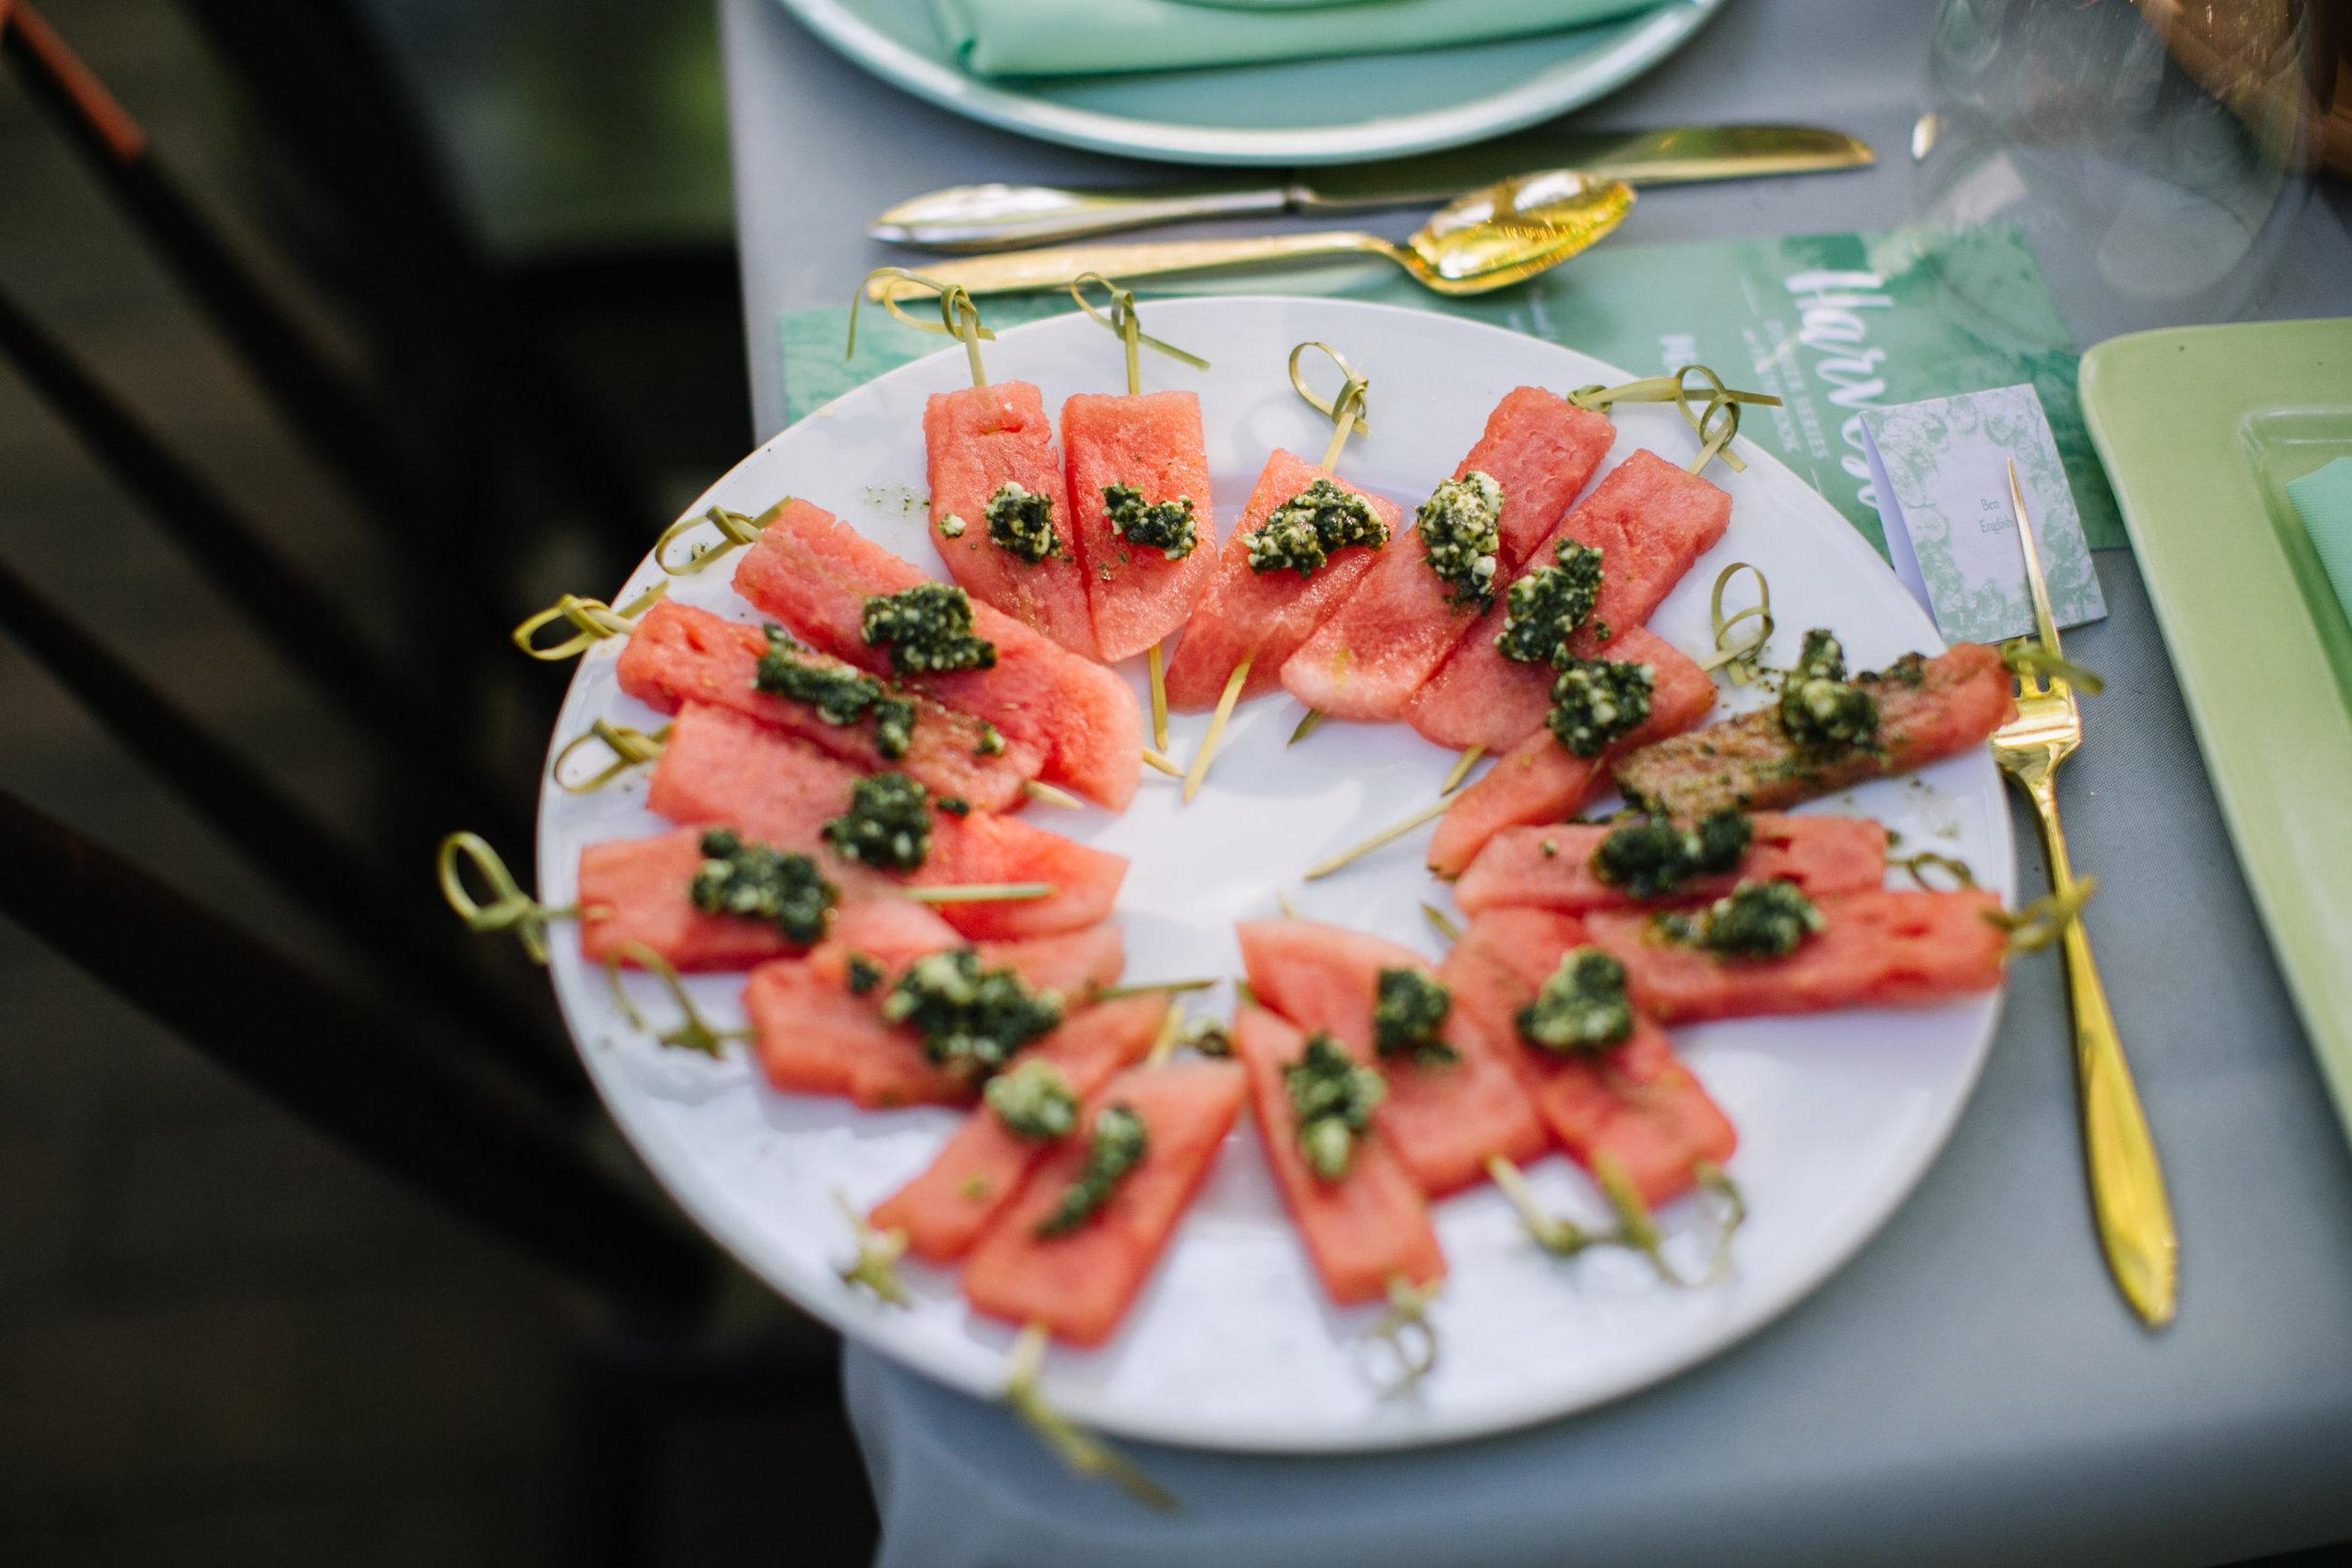 West-Chester-PA-Faunbrook-Harvest-Dinner-Series-Mint-BrittneyRaine-56.JPG